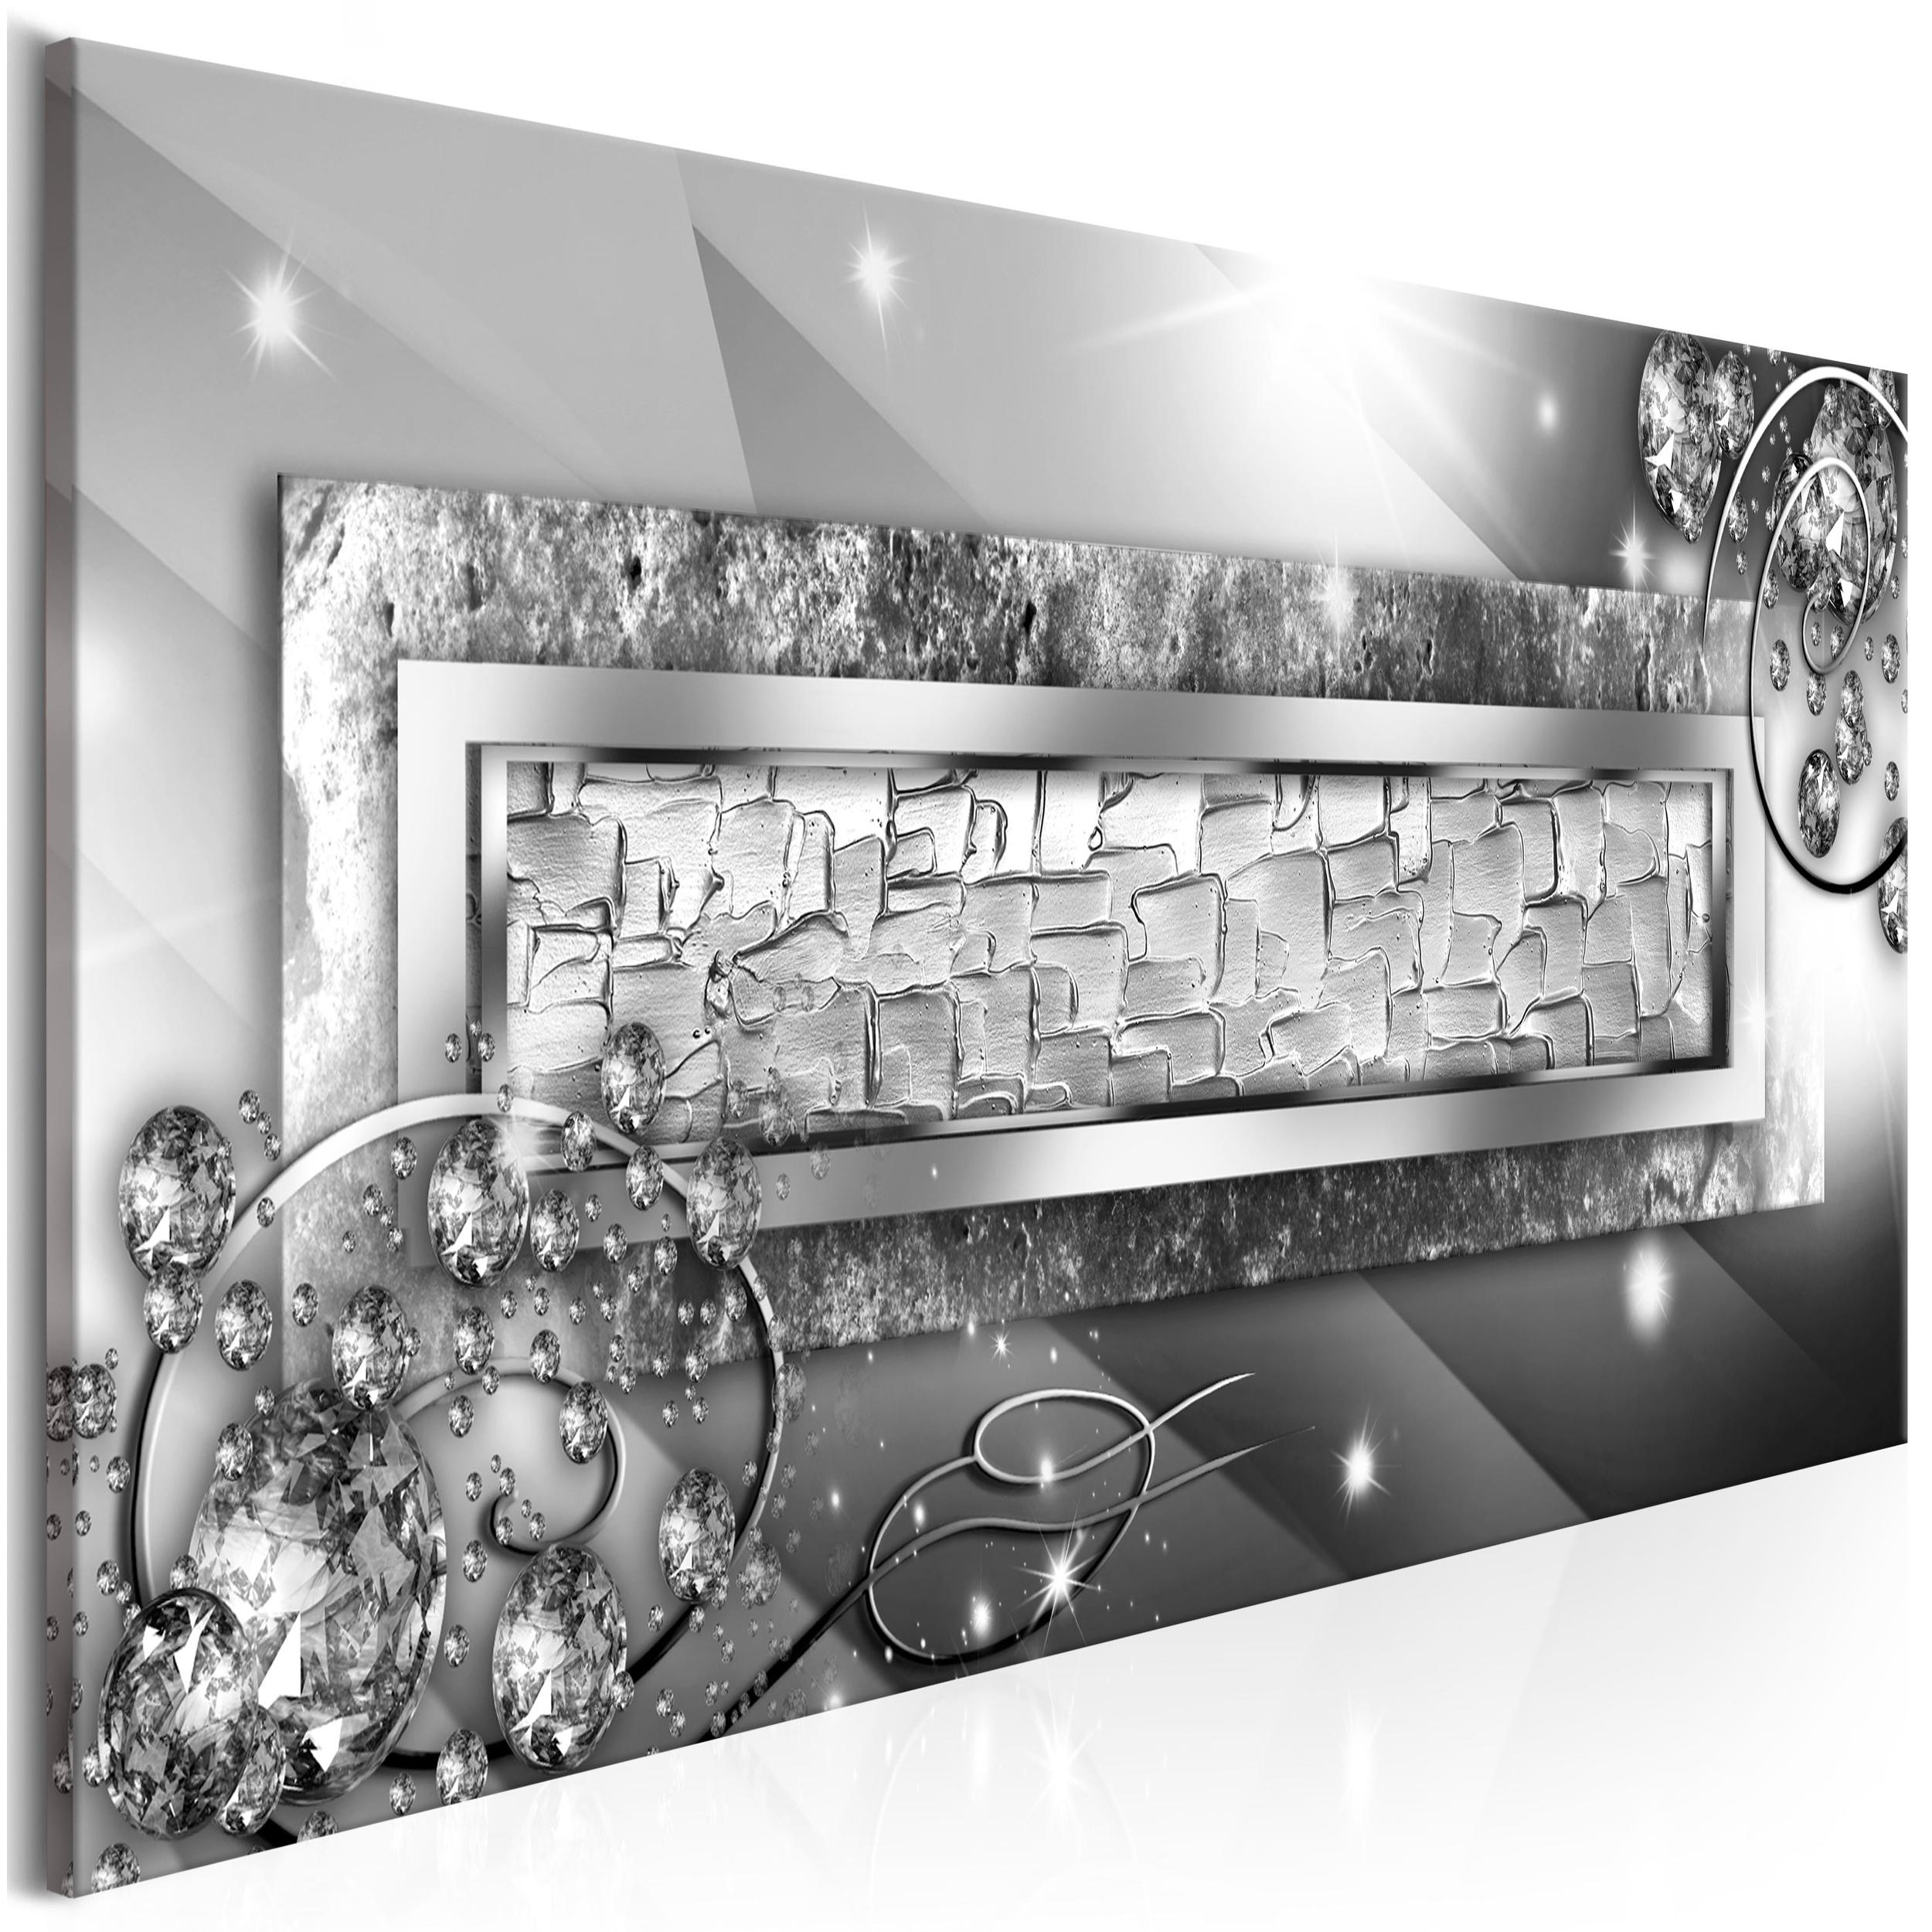 Leinwand bilder abstrakt 100x40 diamente modern silber for Wandbilder wohnzimmer abstrakt